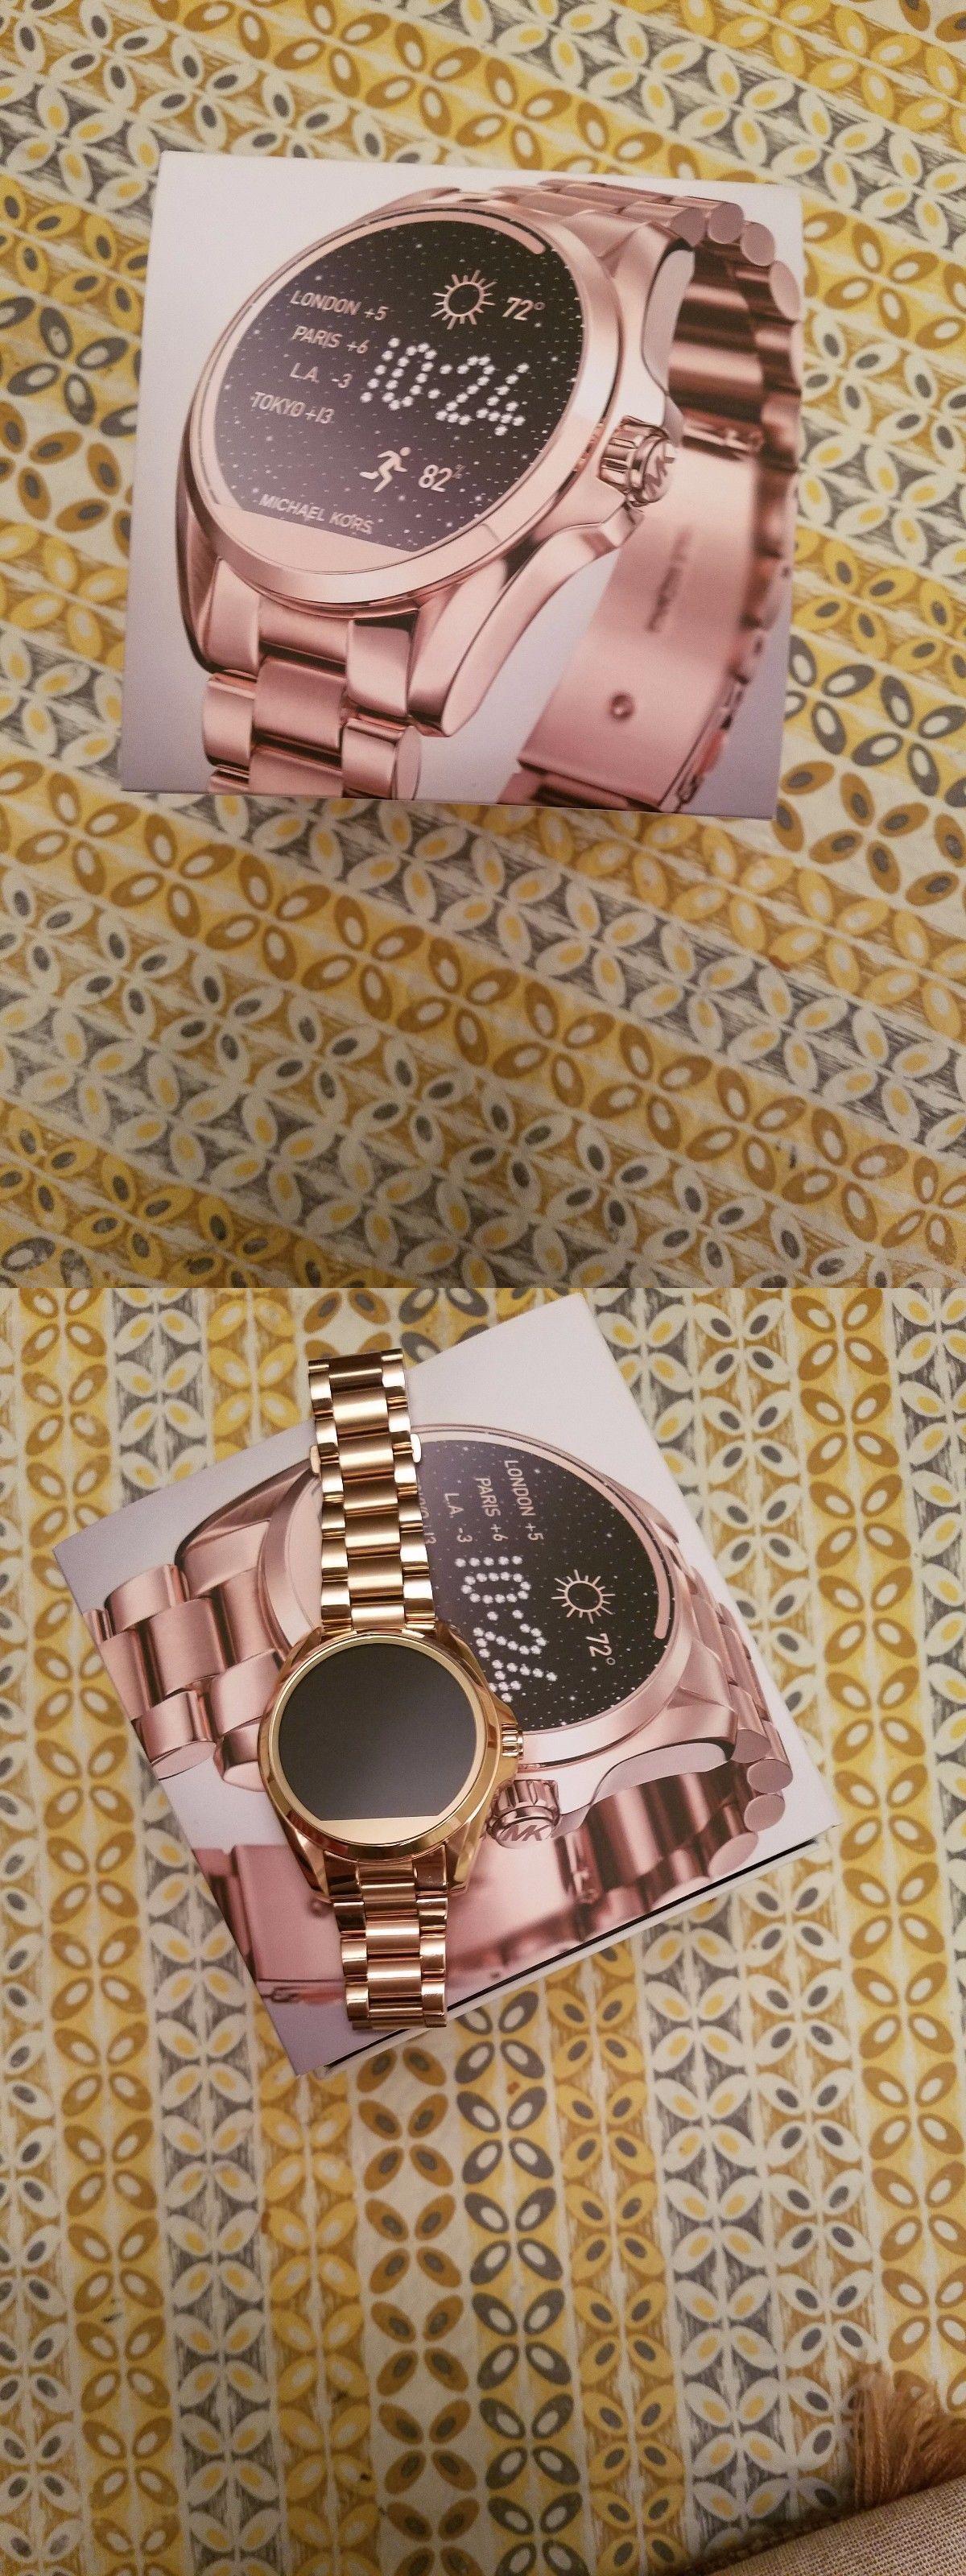 1975eee1bb43 Other Watches 166739  New Mk Smartwatch Women Watch Access Touch Screen  Gold Bradshaw Mkt5001 Open